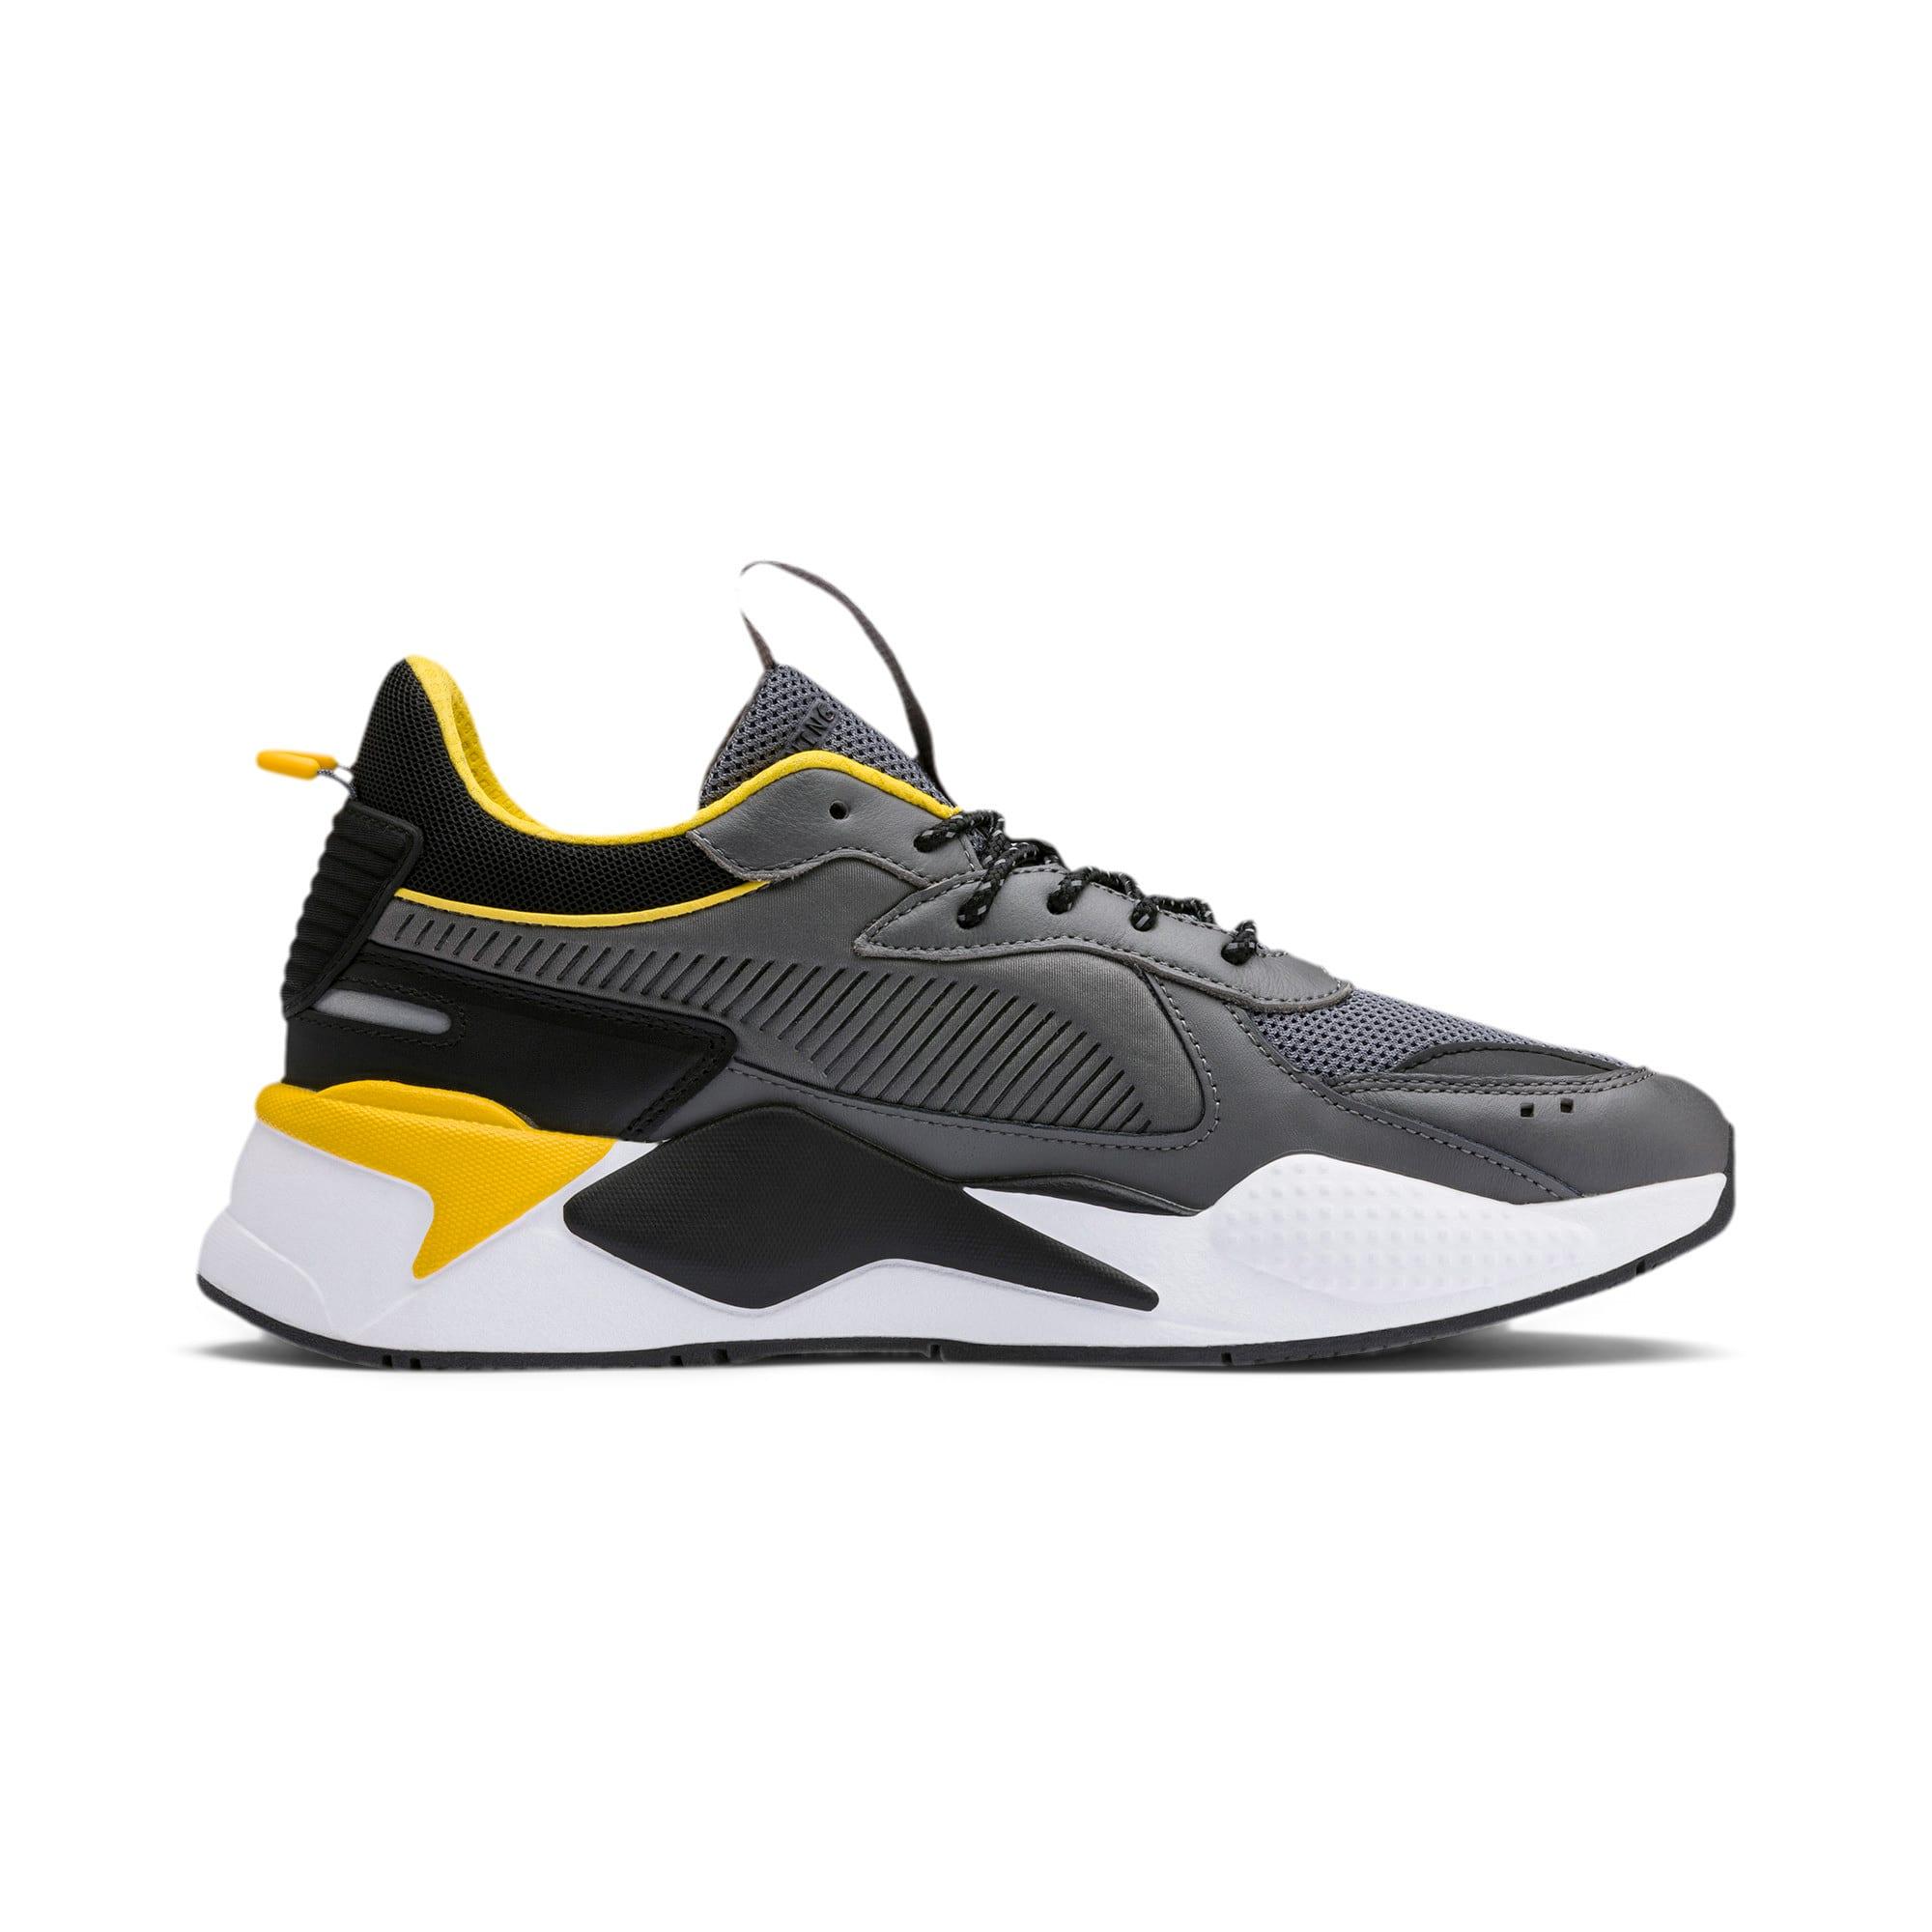 Thumbnail 6 of RS-X Sneaker, CASTLEROCK-Puma Black, medium